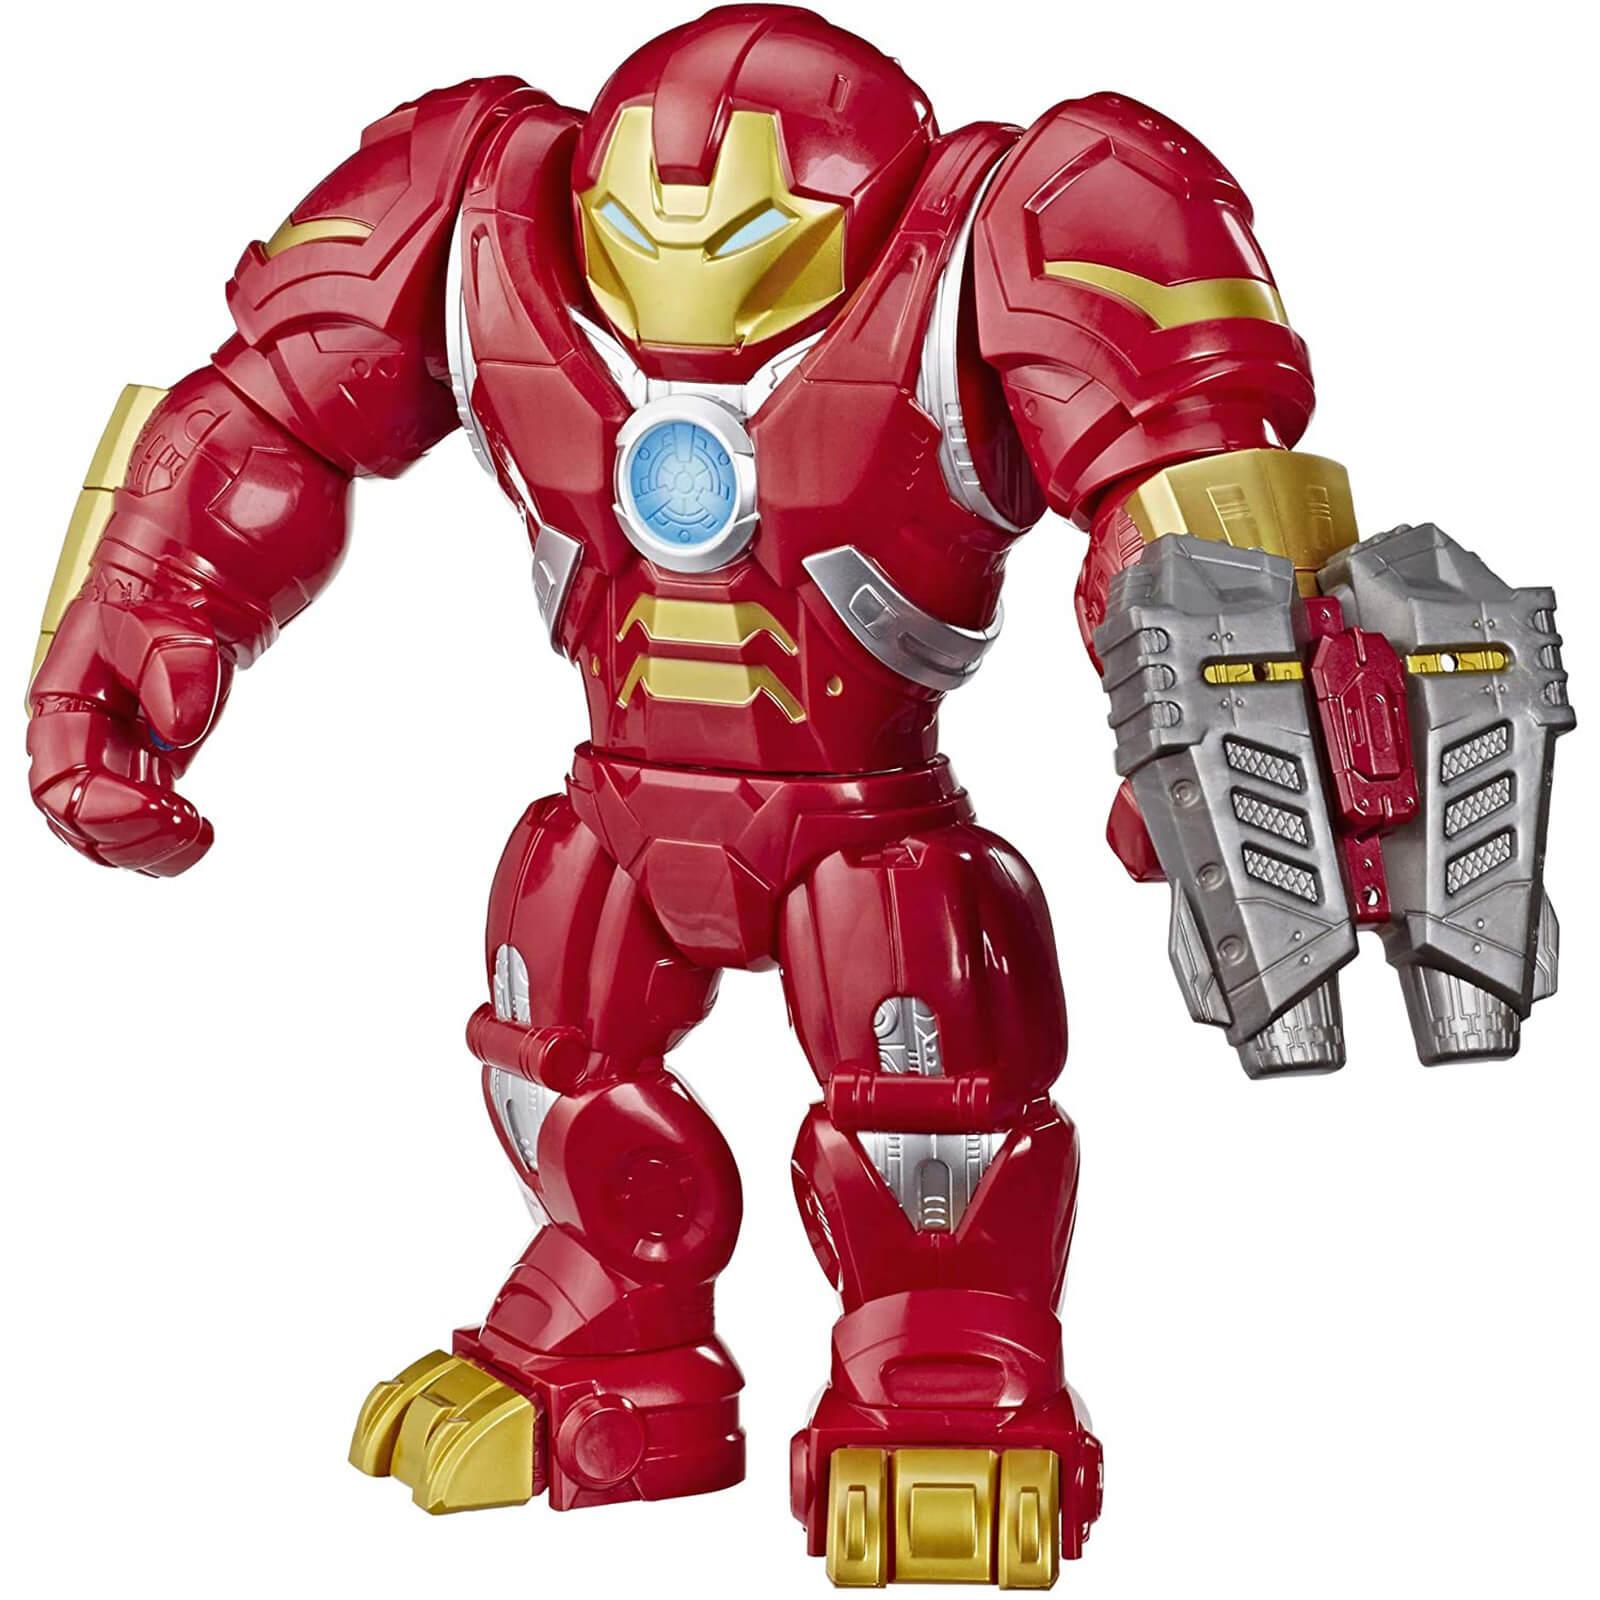 Hasbro Playskool Heroes Mega Mighties Marvel Super Hero Adventures Hulkbuster 30cm Action Figure